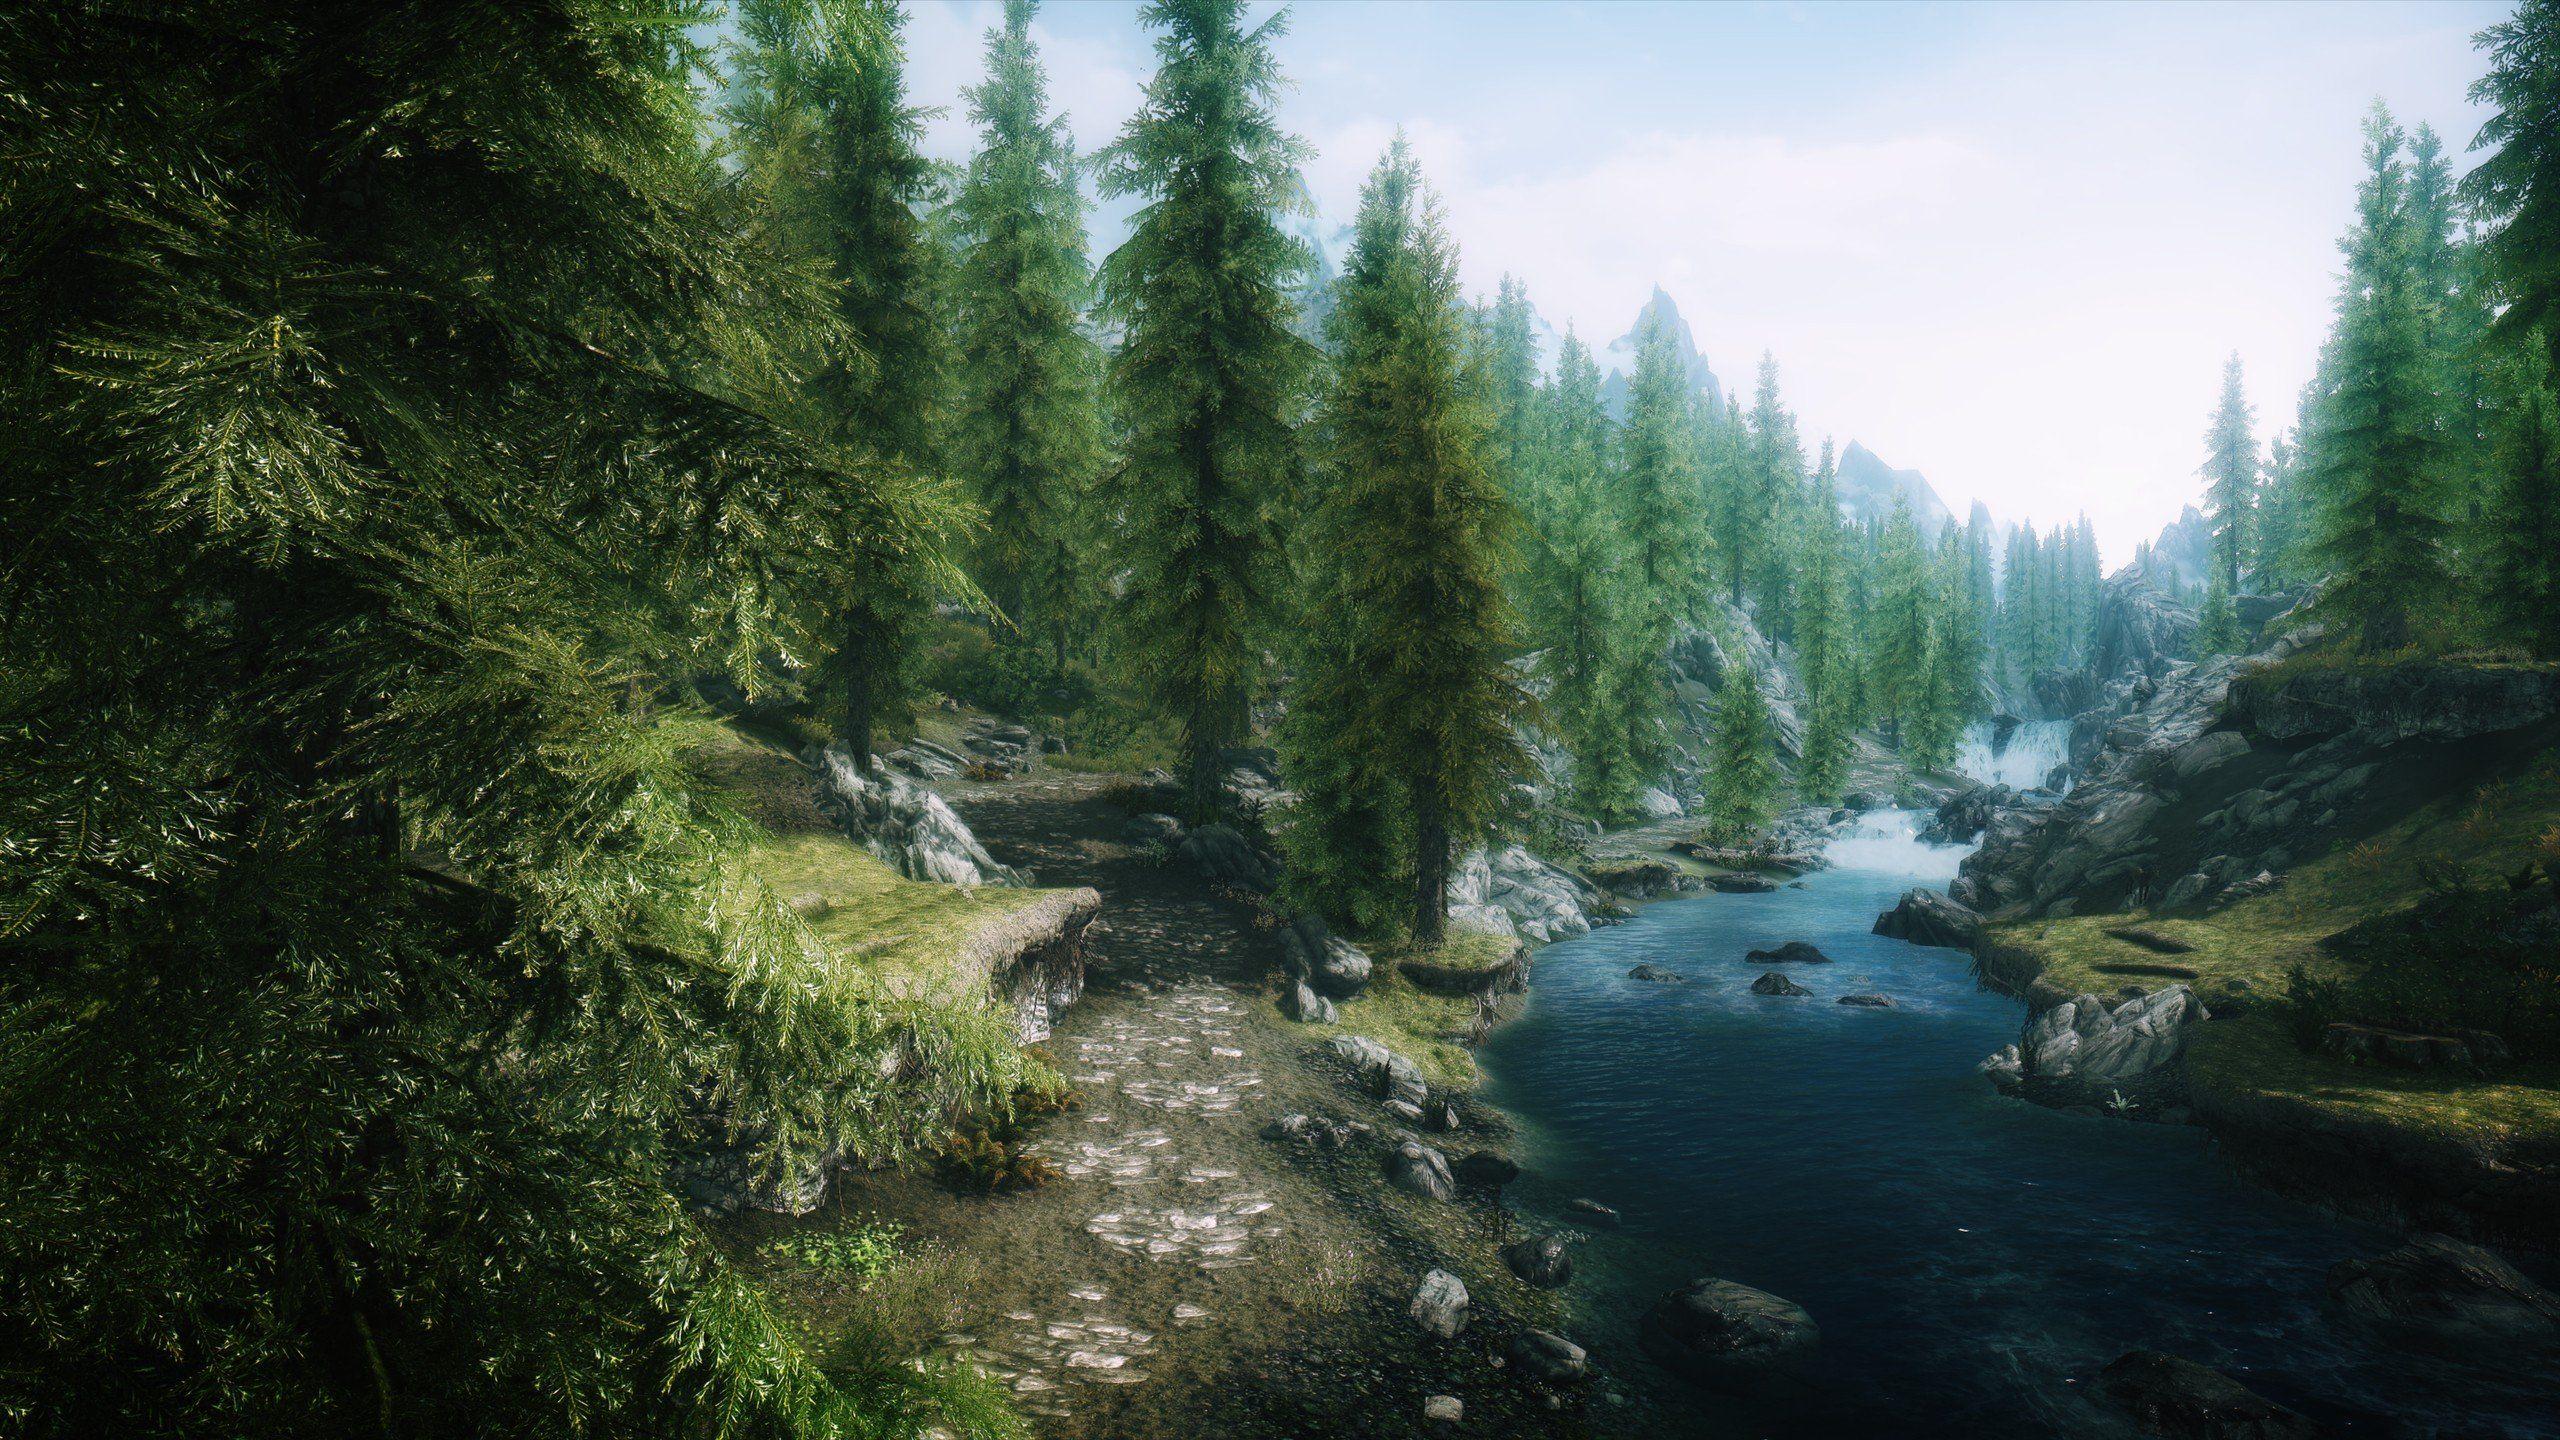 Video Games Landscapes Nature Trees Forests Rivers The Elder Scrolls V Skyrim Wallpaper 2560x1440 289505 Skyrim Wallpaper Skyrim Landscape